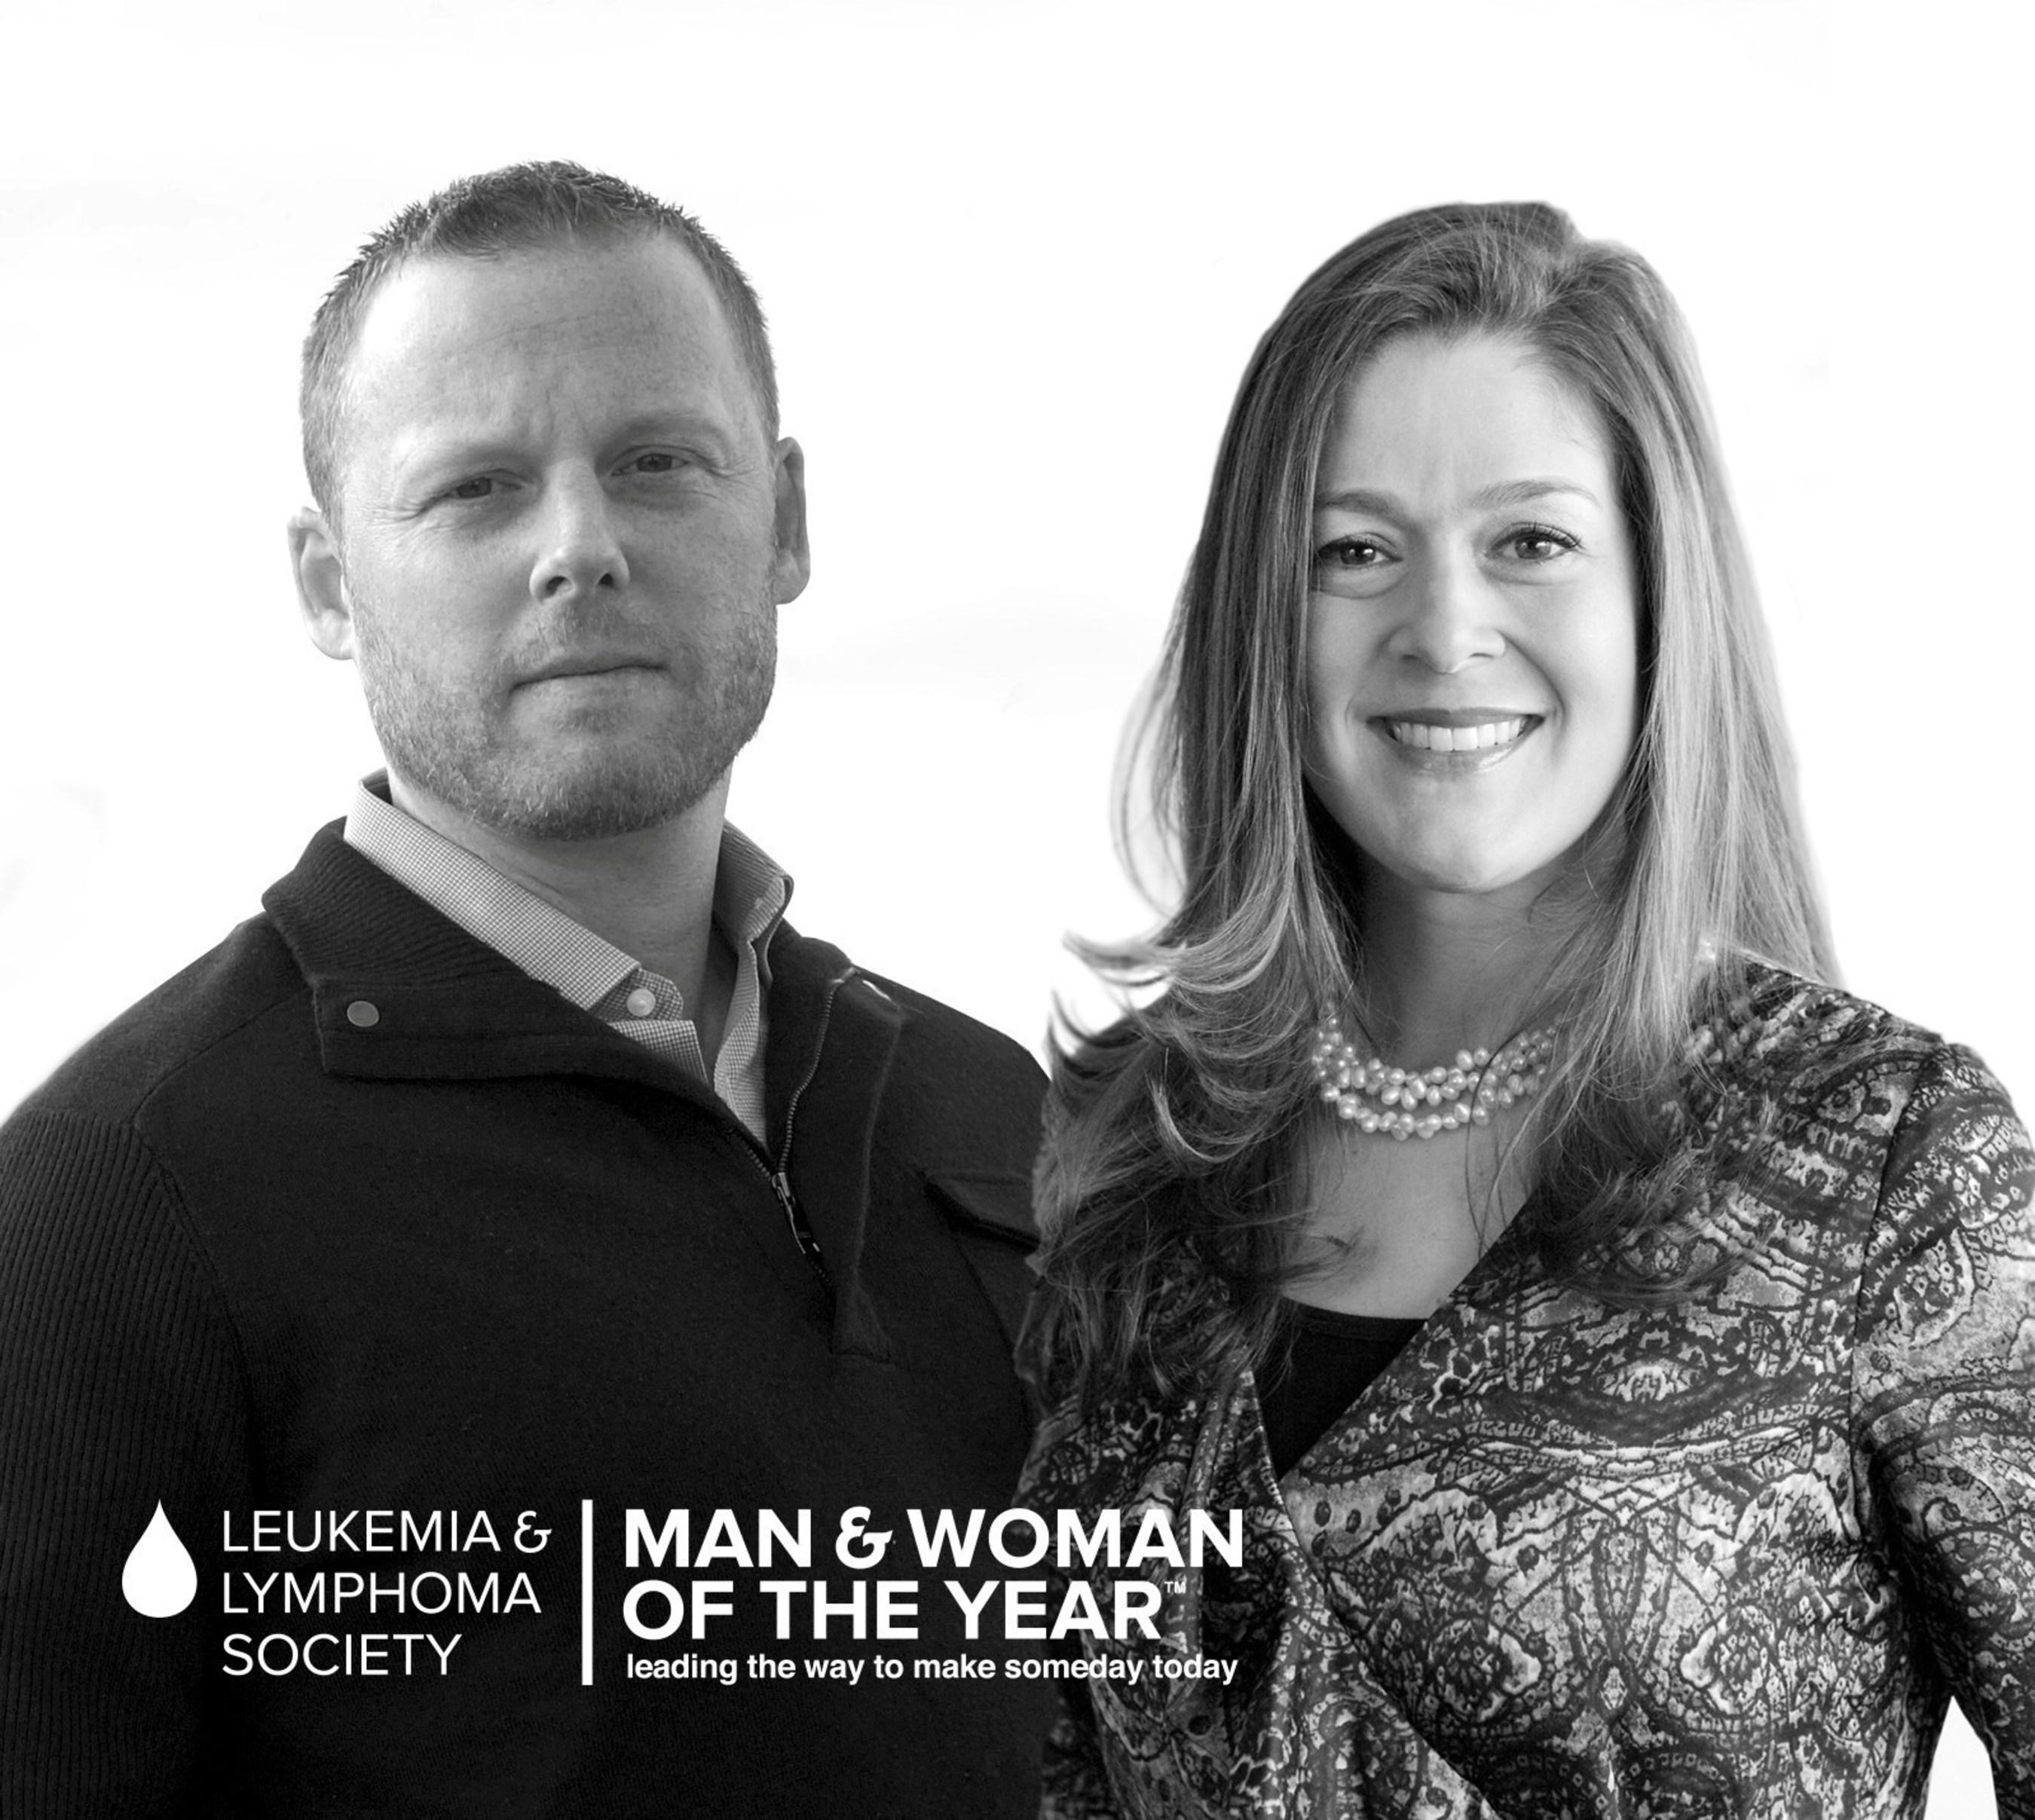 Congratulations to The Leukemia & Lymphoma Society's 2015 National Man & Woman of the Year winners, Jason ...